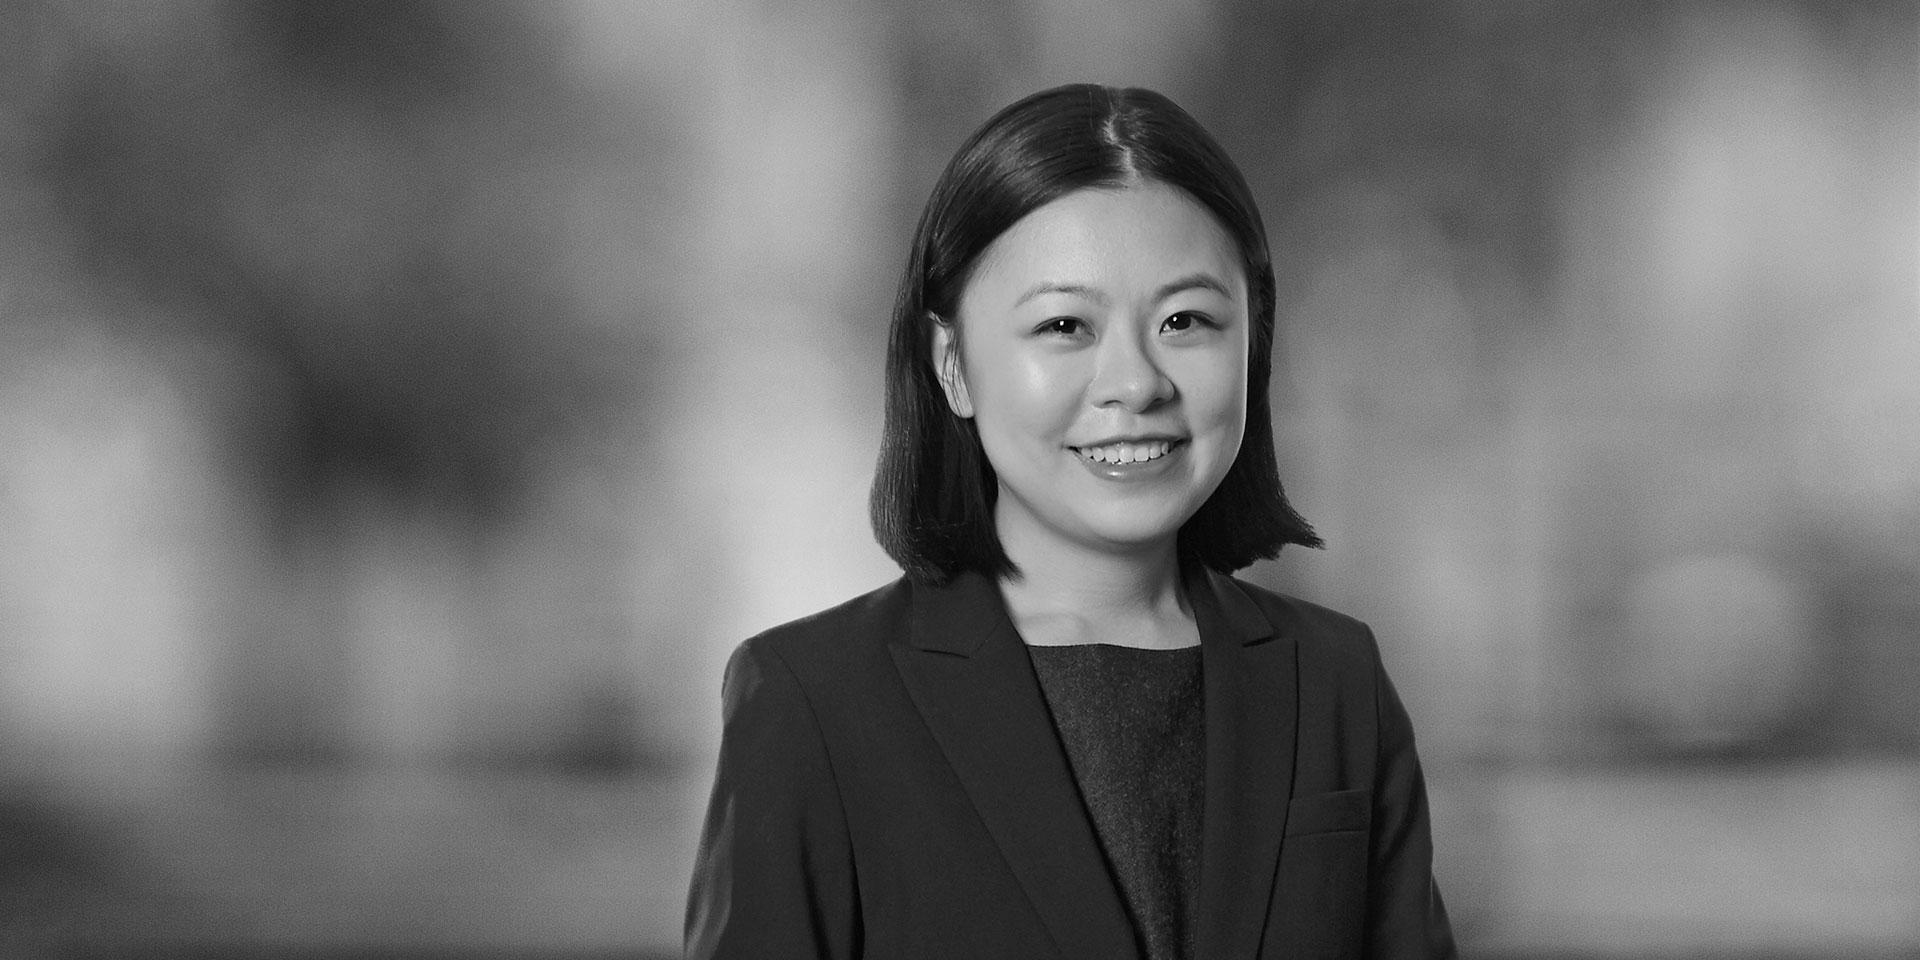 Jacqueline Chung